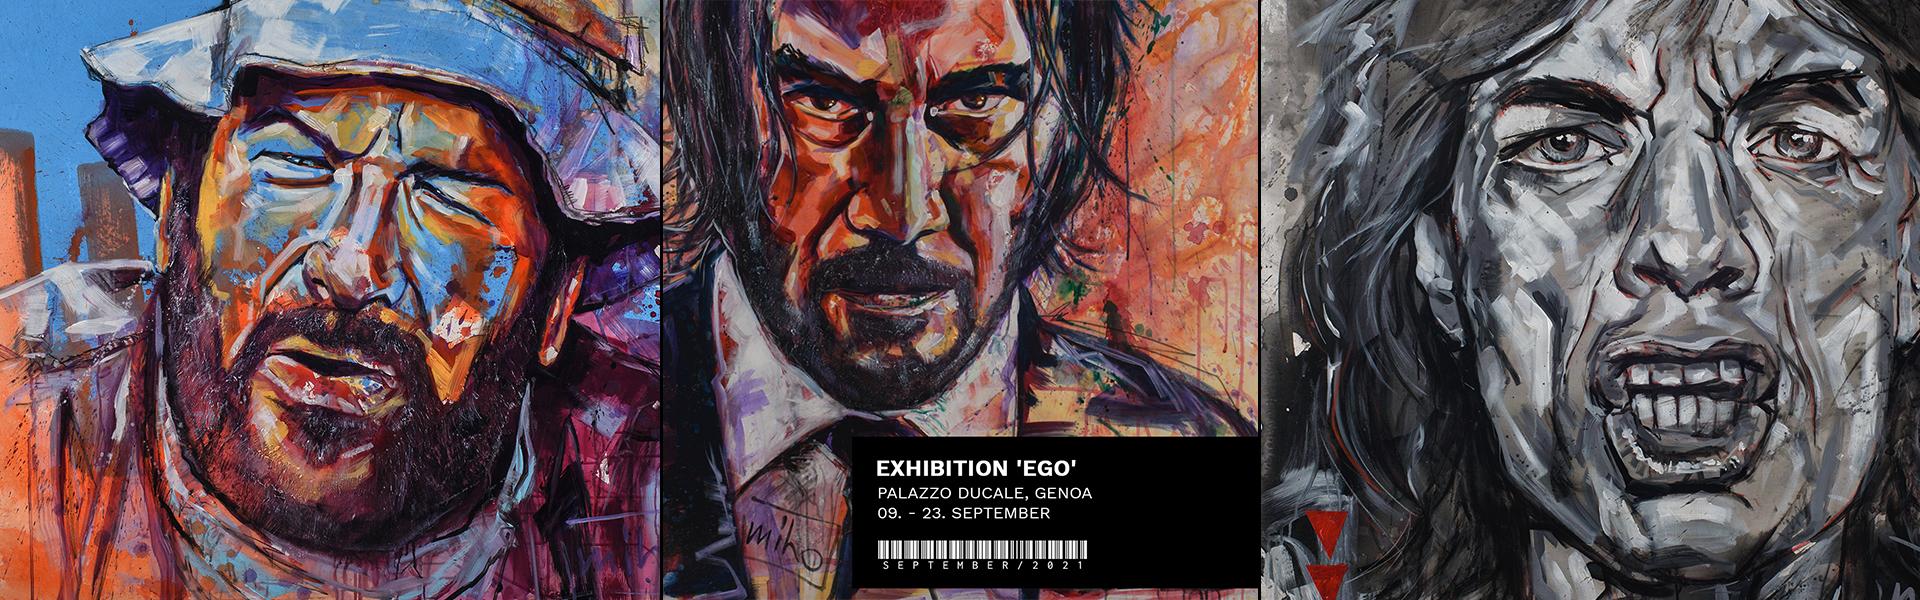 miho in Genoa September 2021 - Ego, Palazzo Ducale